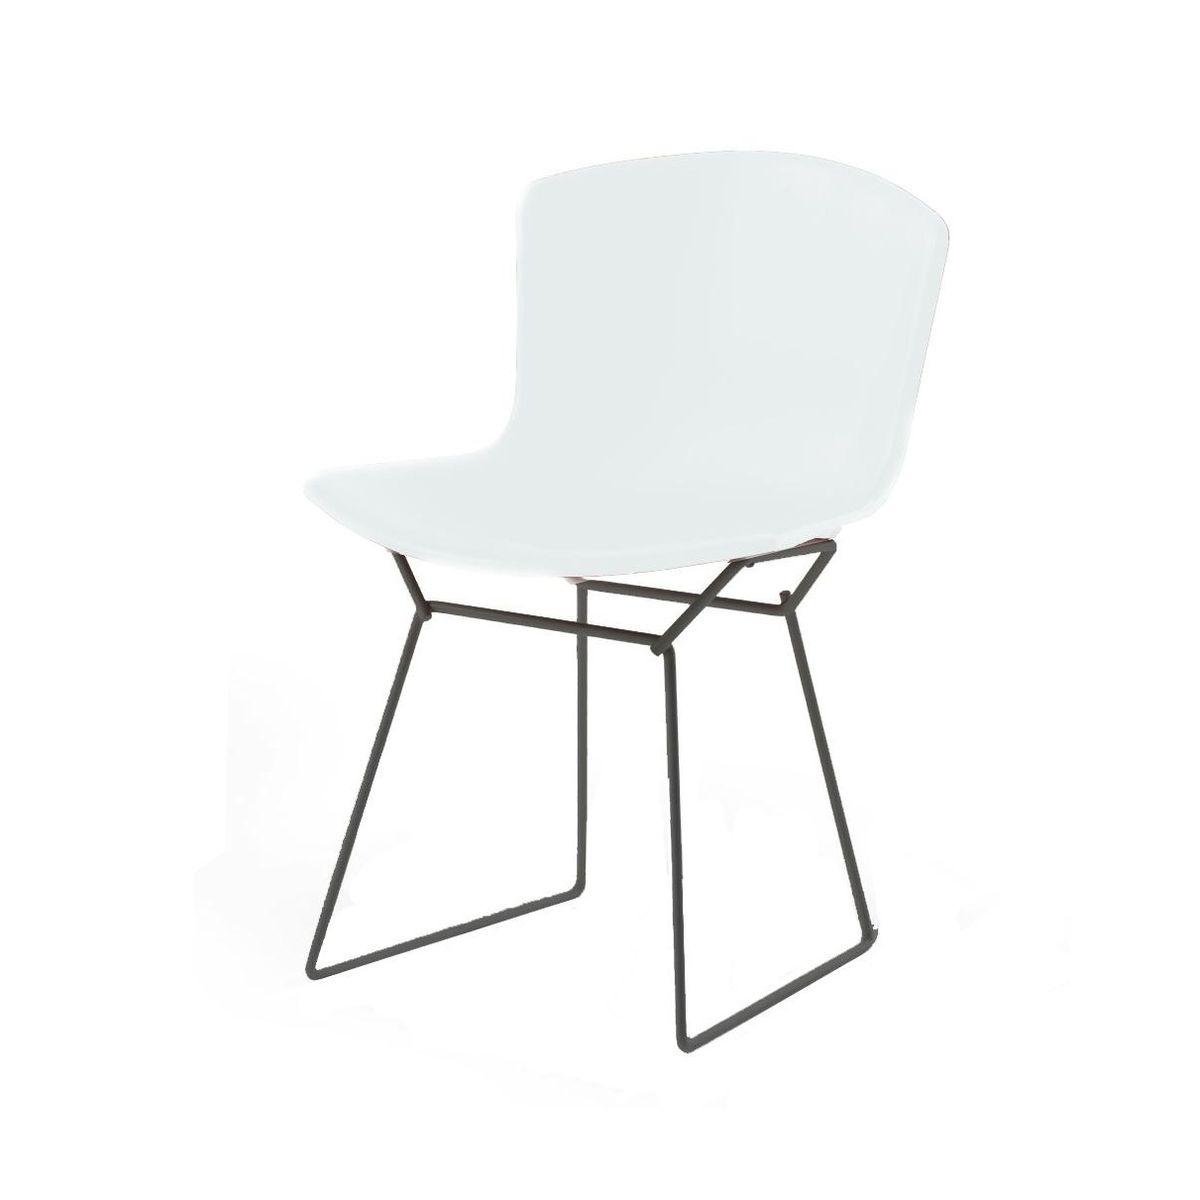 bertoia plastic stuhl gestell schwarz knoll. Black Bedroom Furniture Sets. Home Design Ideas